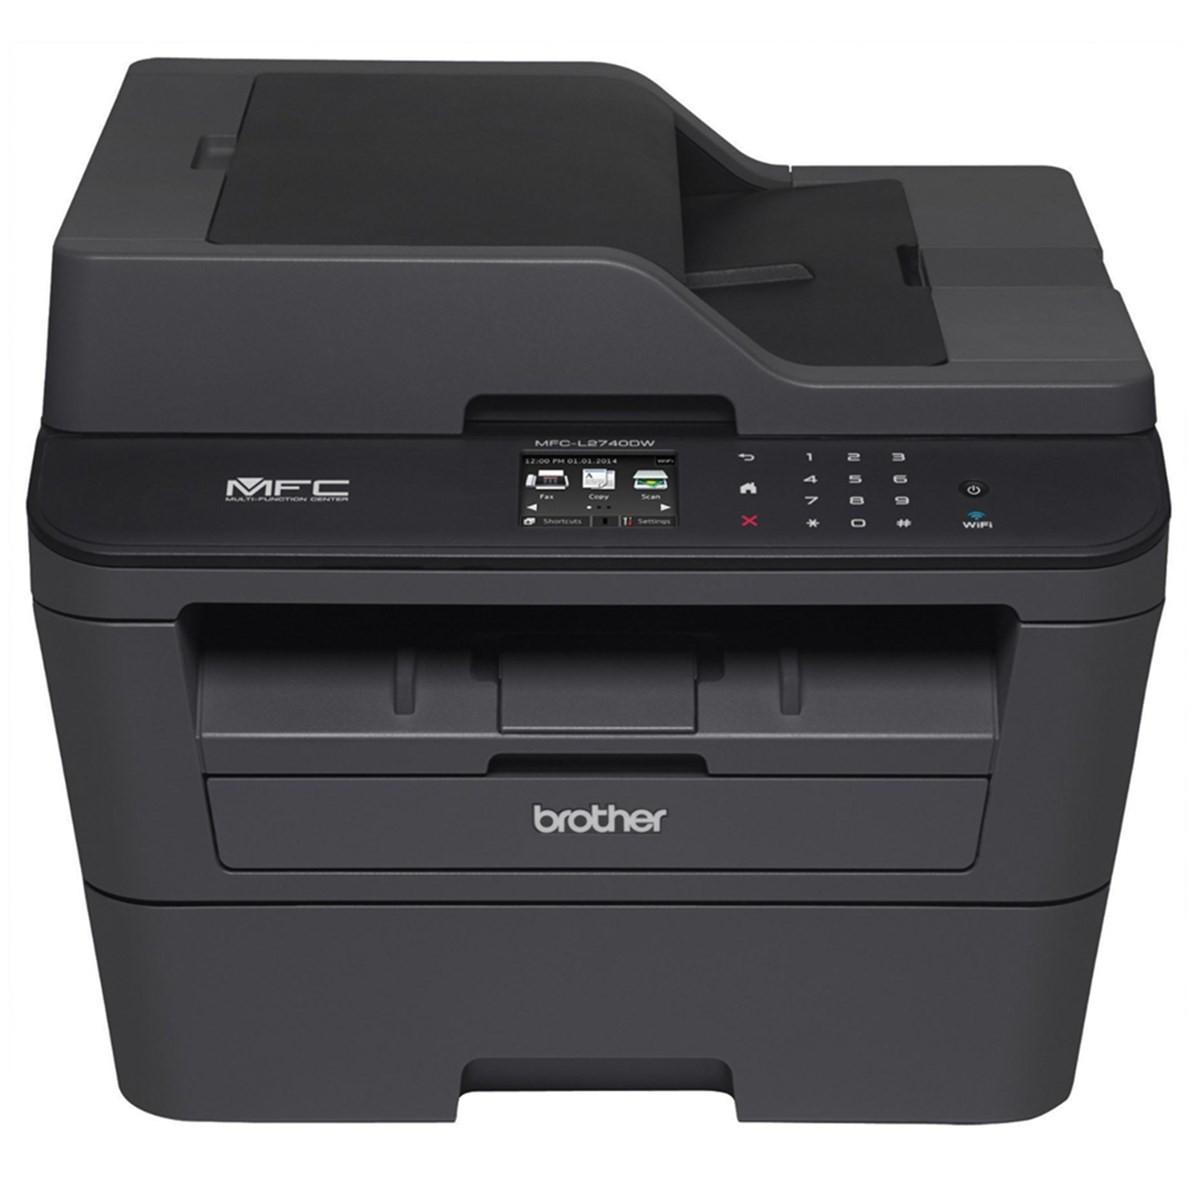 Impressora Brother MFC-L2740DW MFCL2740 Multifuncional Laser Monocromática com Wireless e Duplex